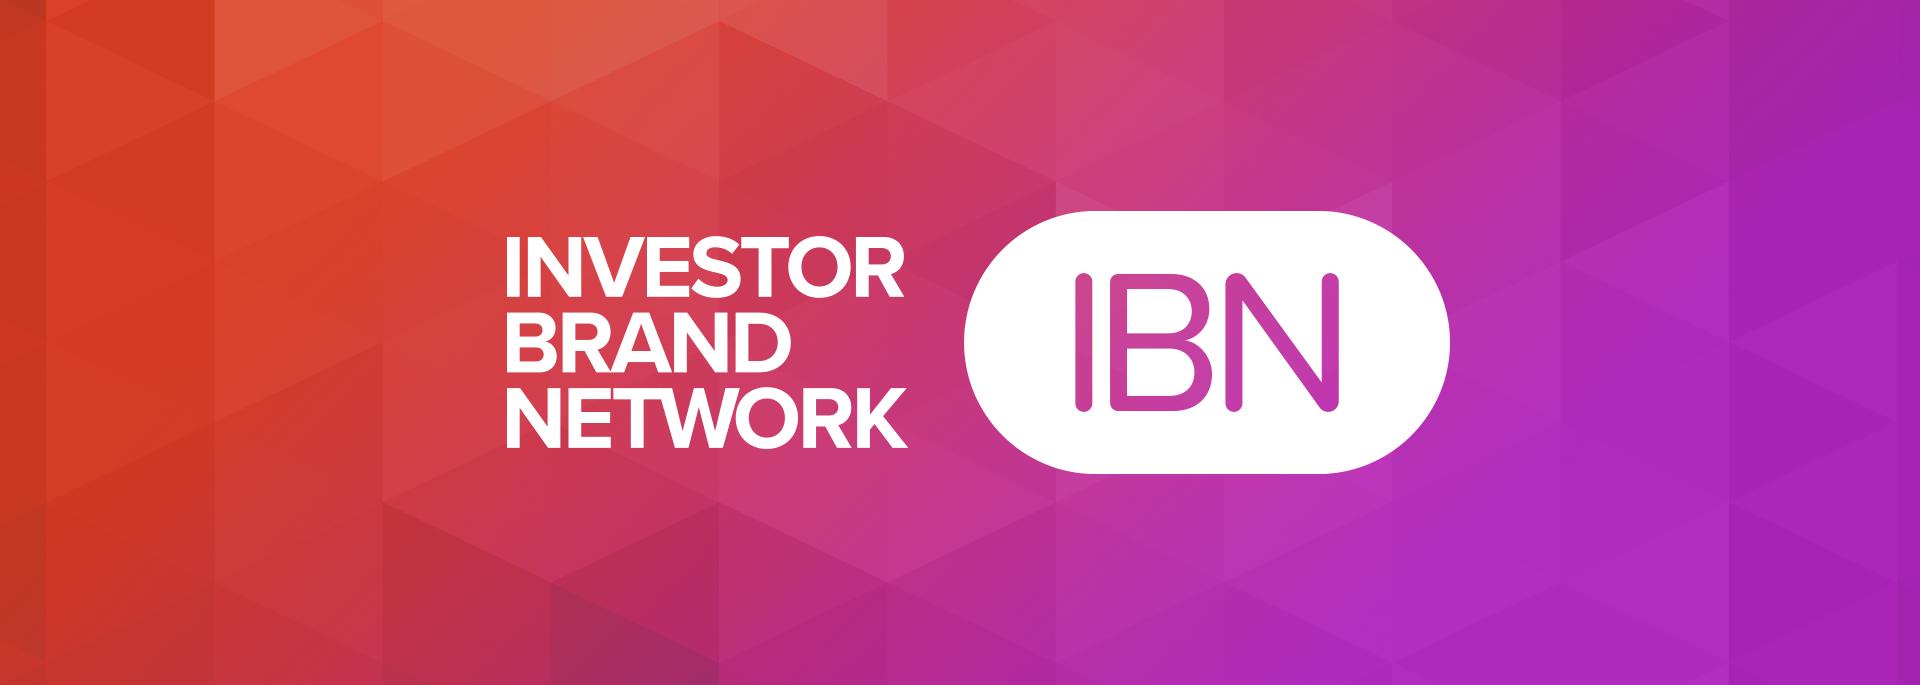 InvestorBrandNetwork Media channel